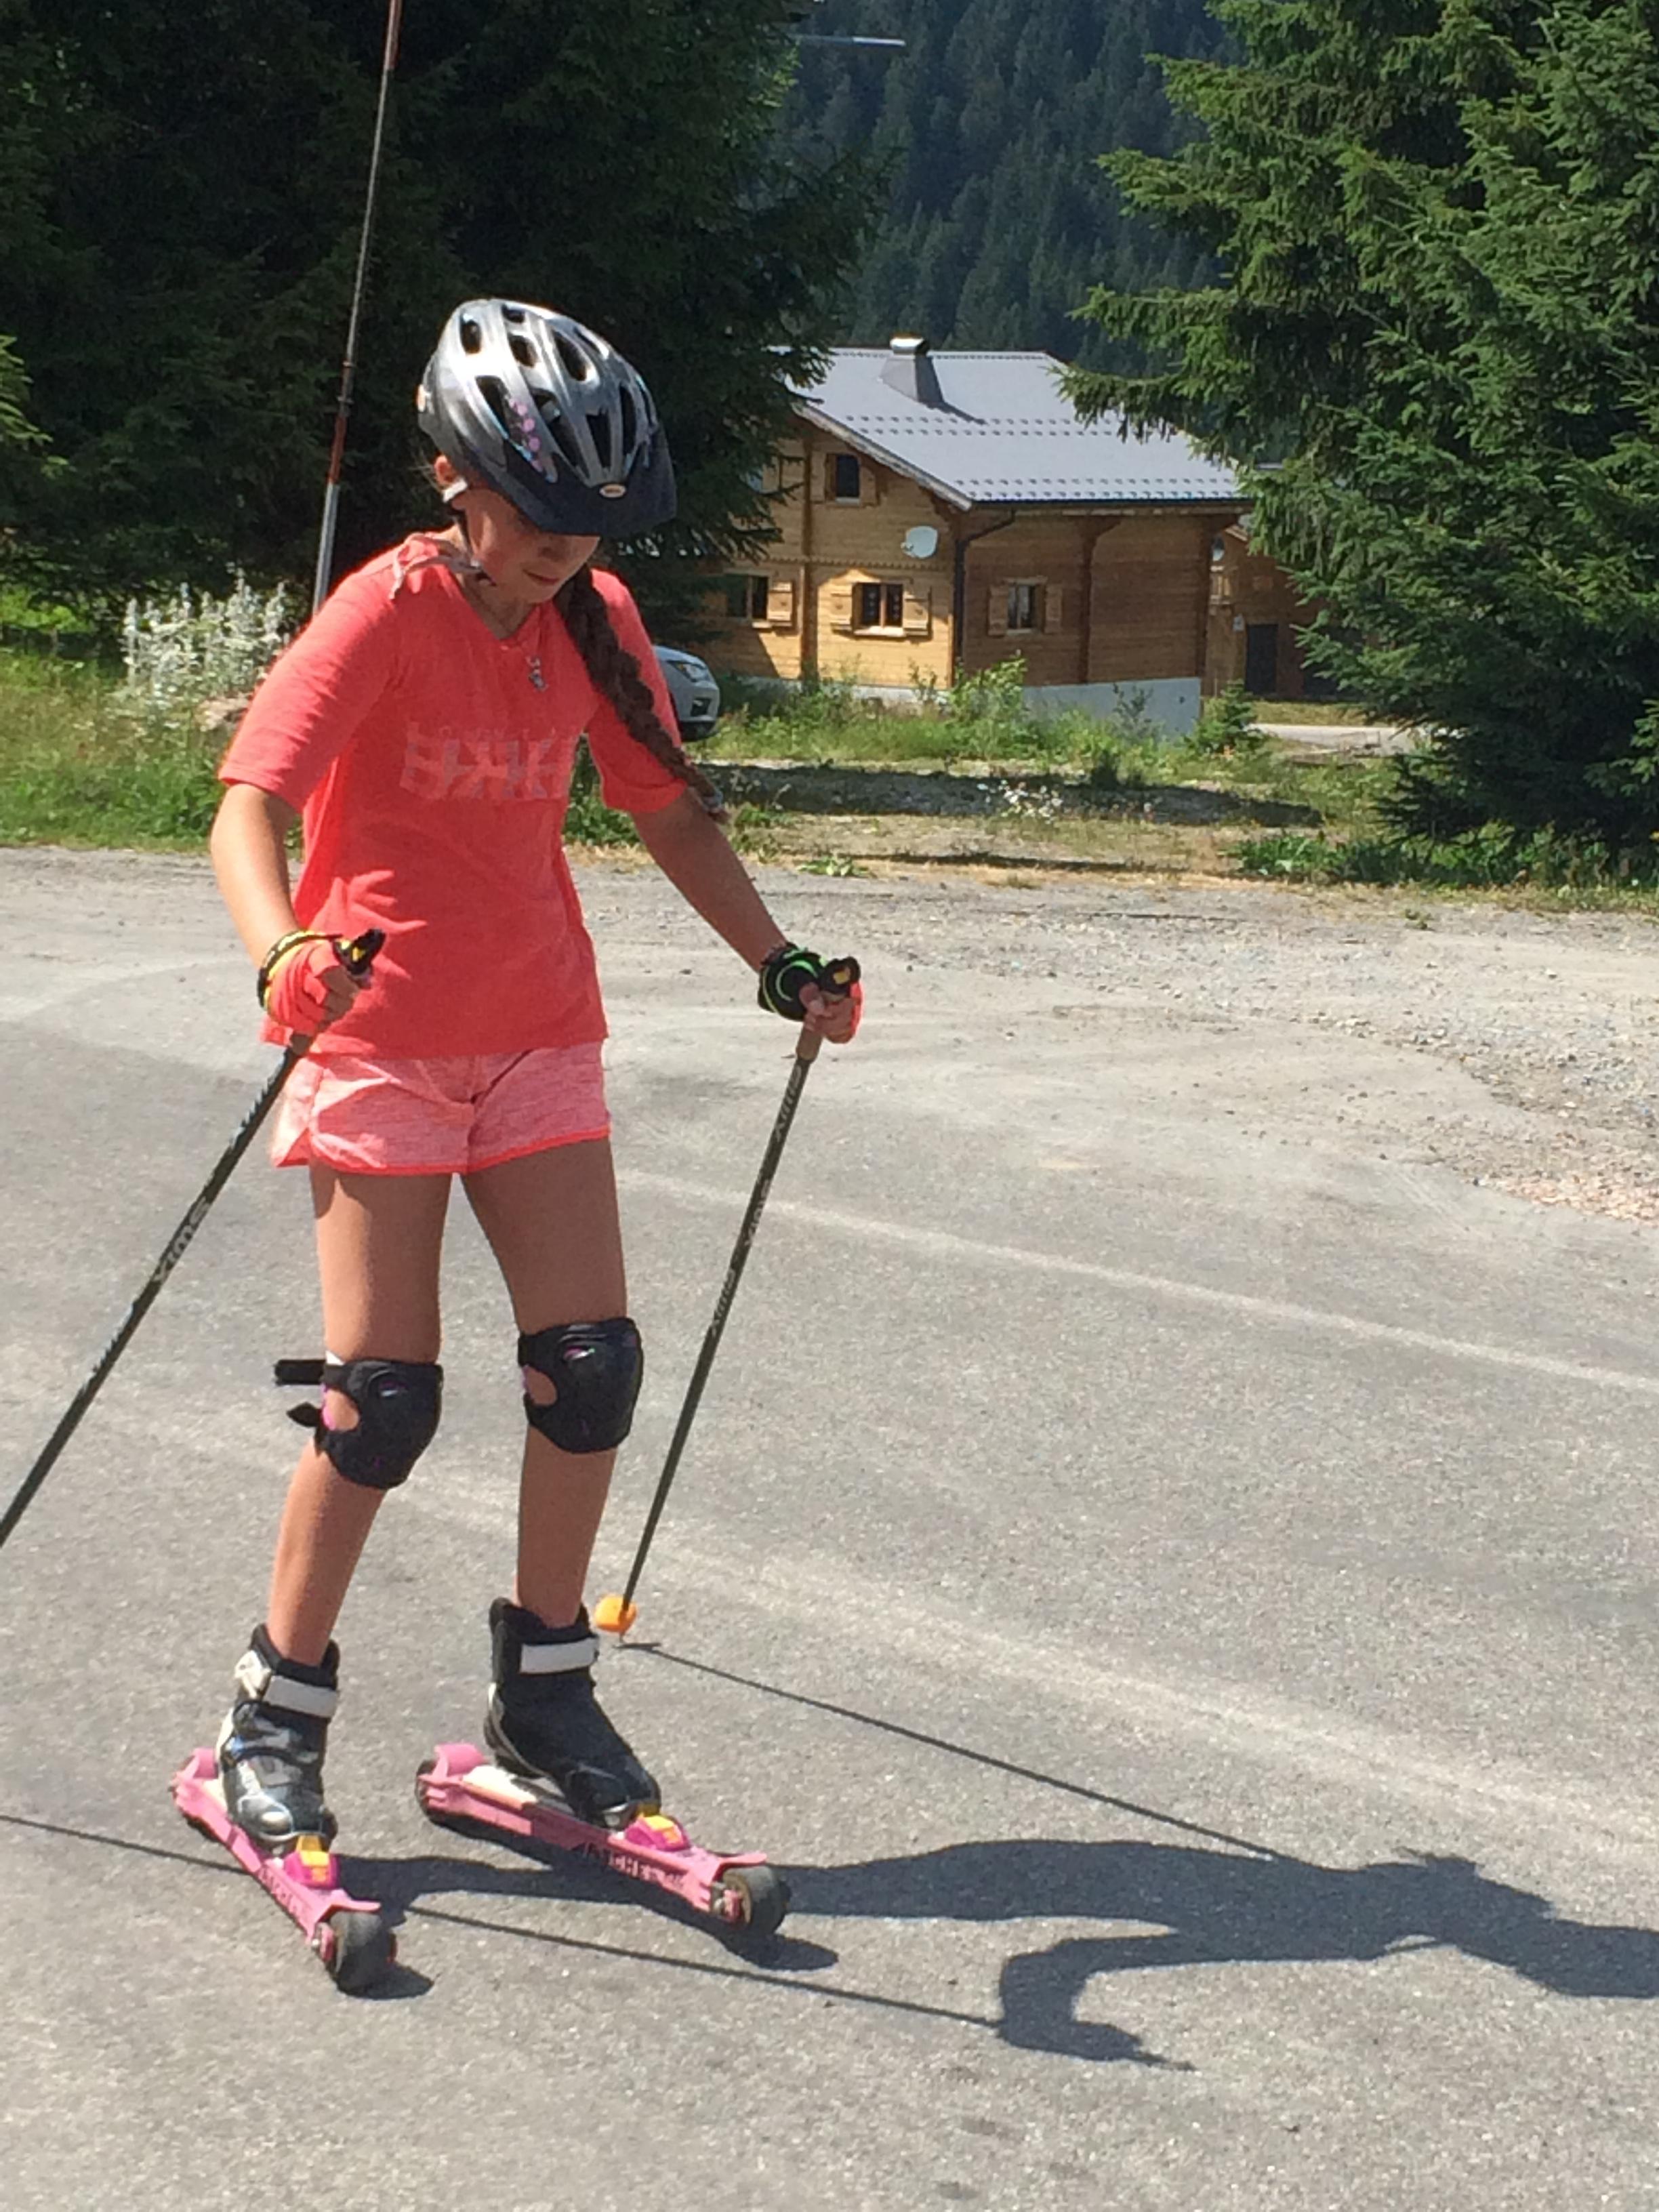 Ski à roulettes ESI Praz de Lys